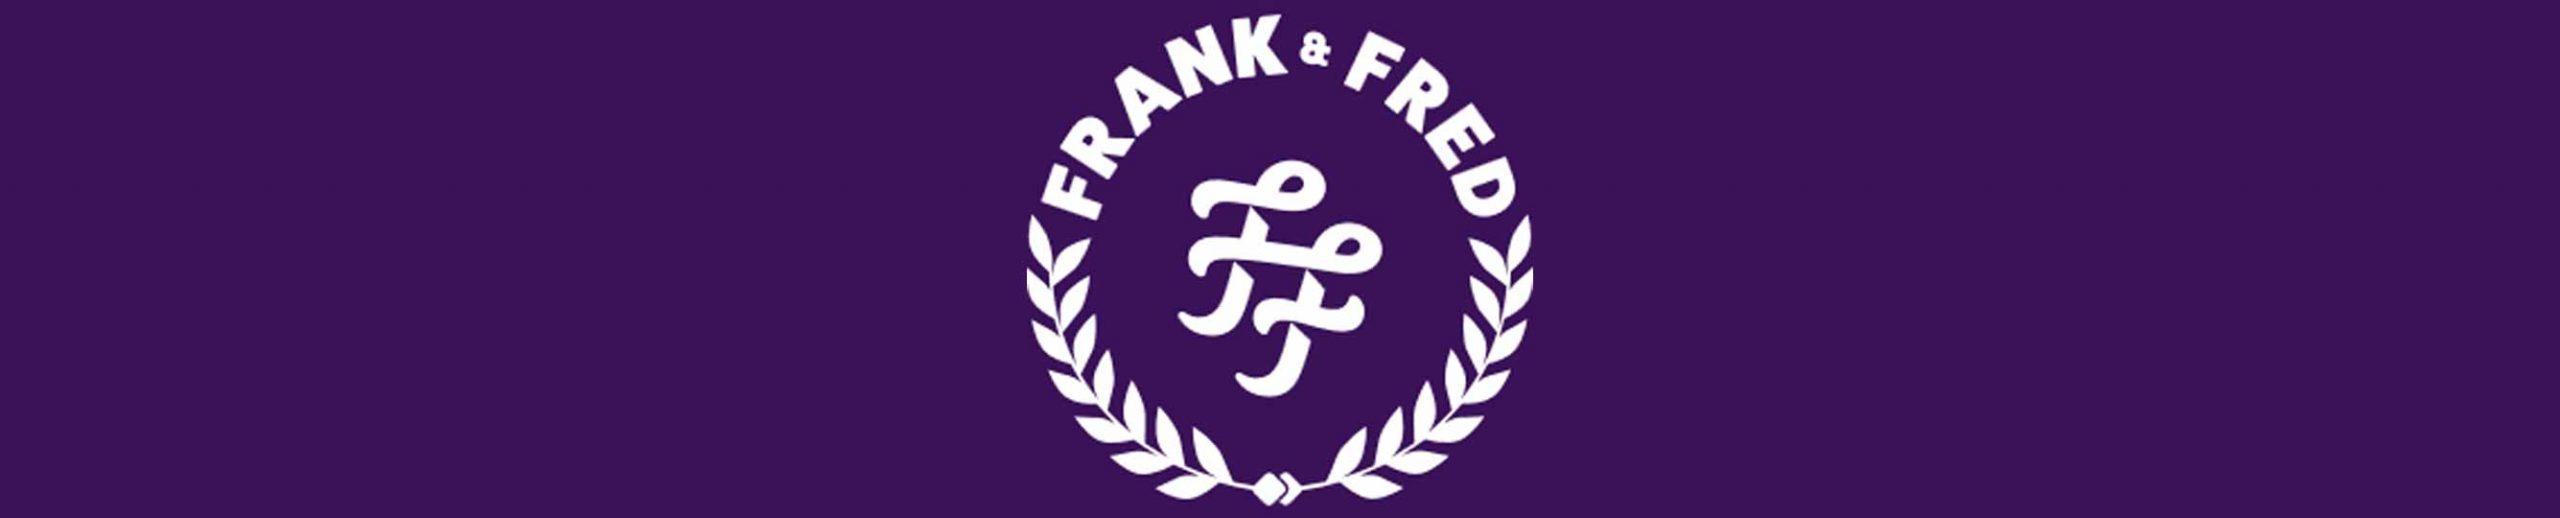 Frank & Fred Test